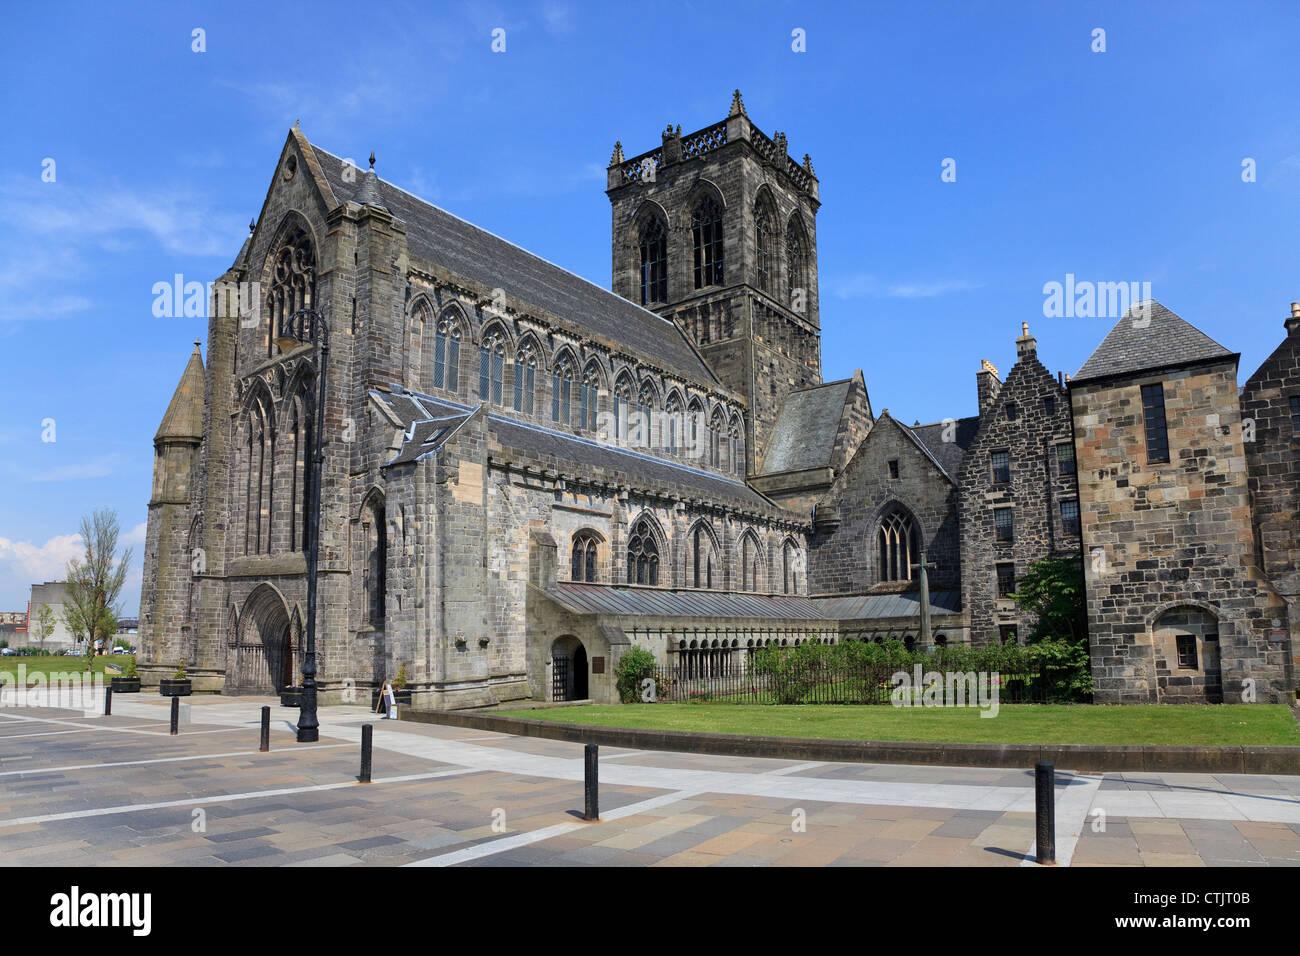 Paisley abbey renfrewshire scotland uk stock photo royalty paisley abbey renfrewshire scotland uk sciox Image collections